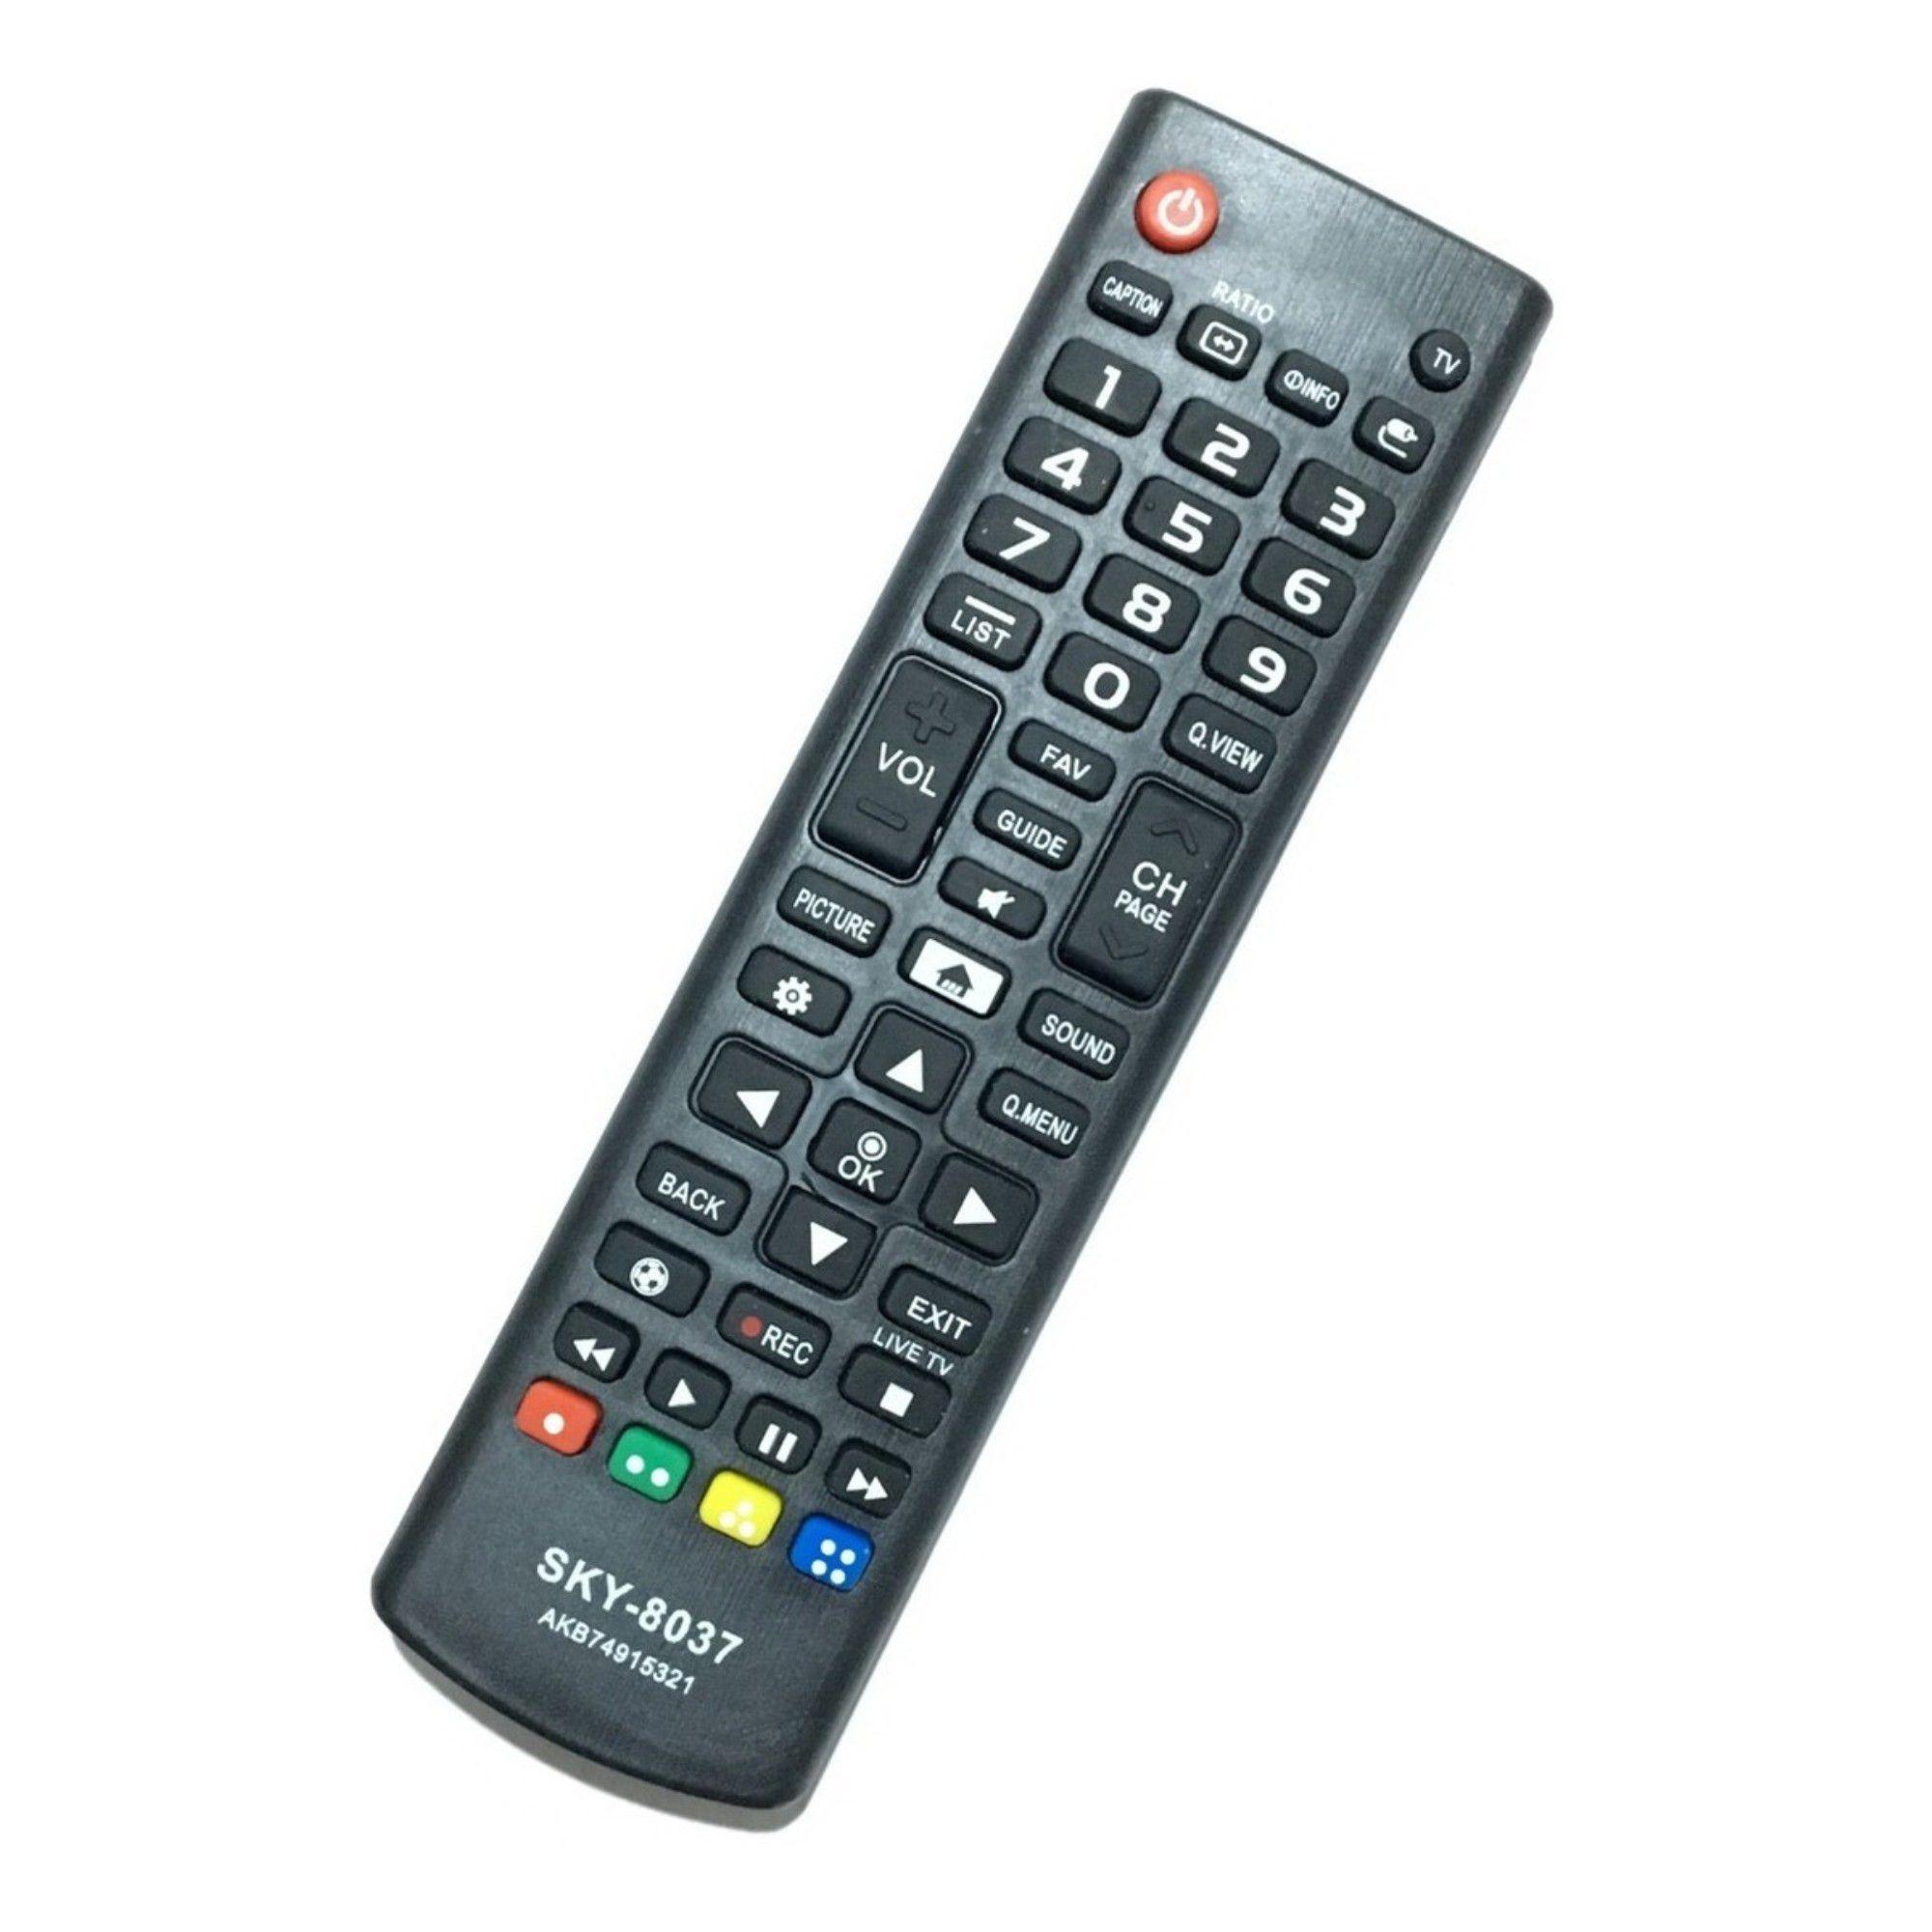 Controle Remoto Tv LG Sky-8037